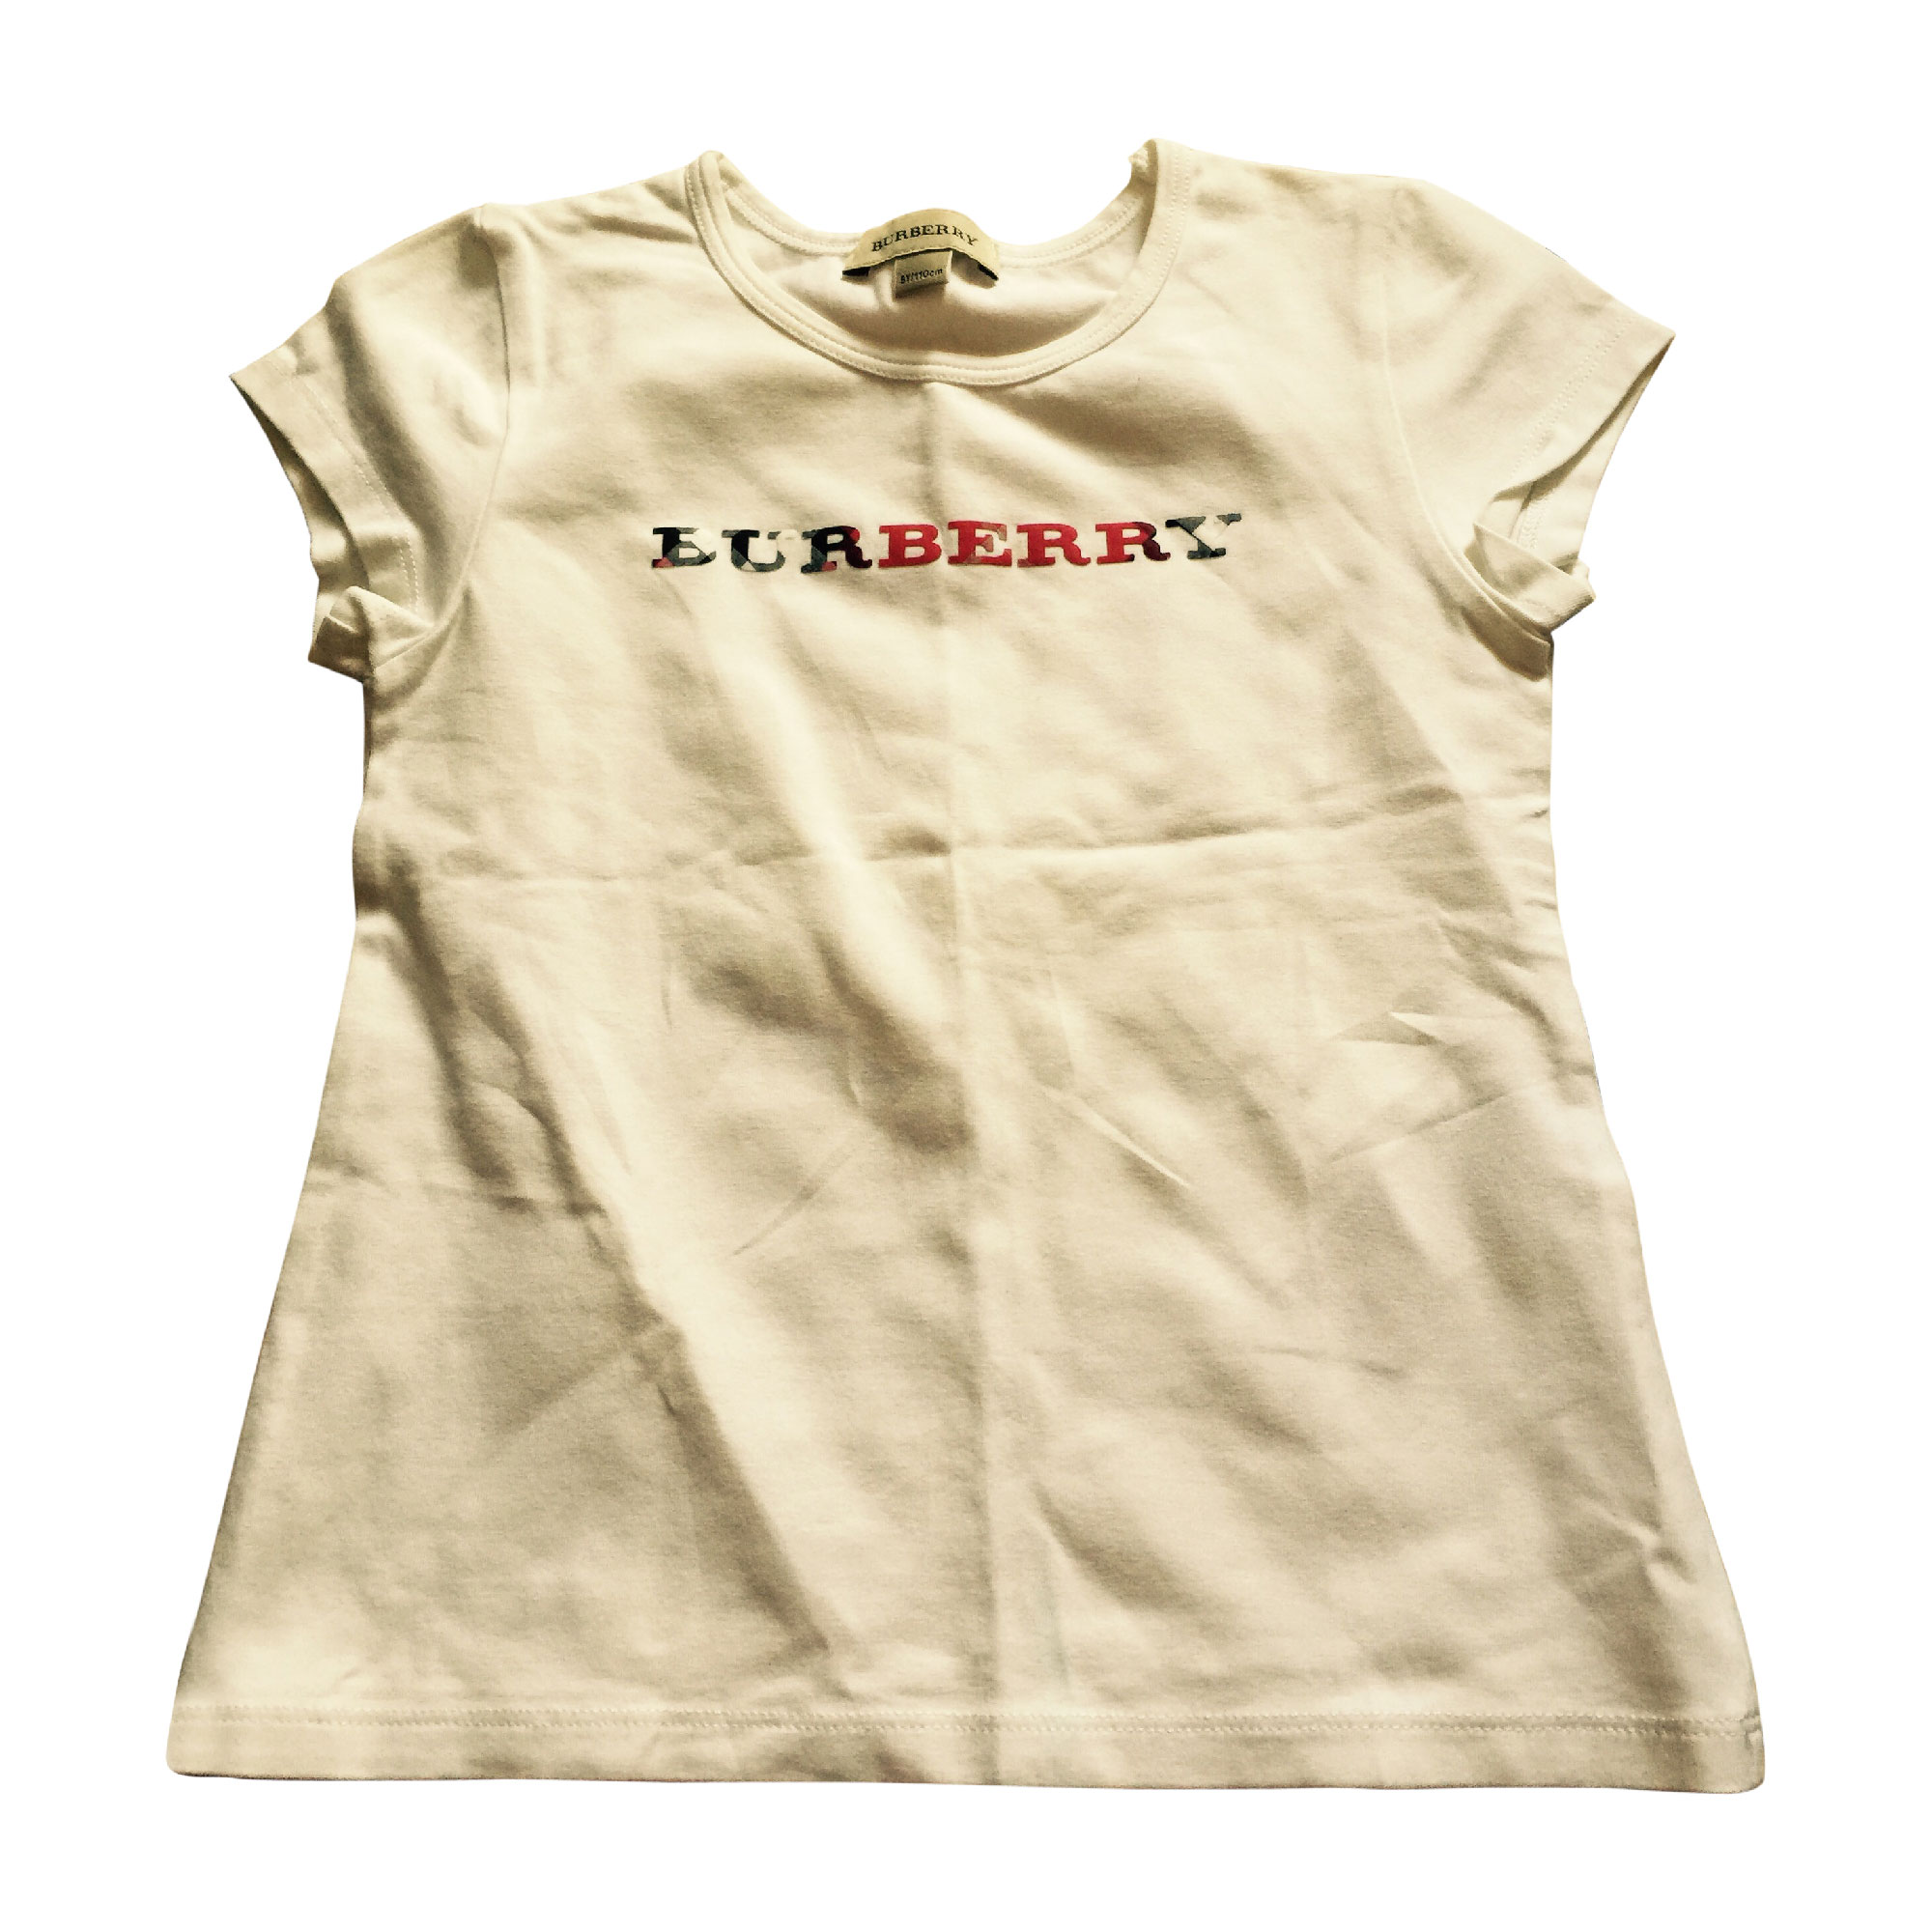 68d8c3884ce0 Top, Tee-shirt BURBERRY Blanc, blanc cassé, écru